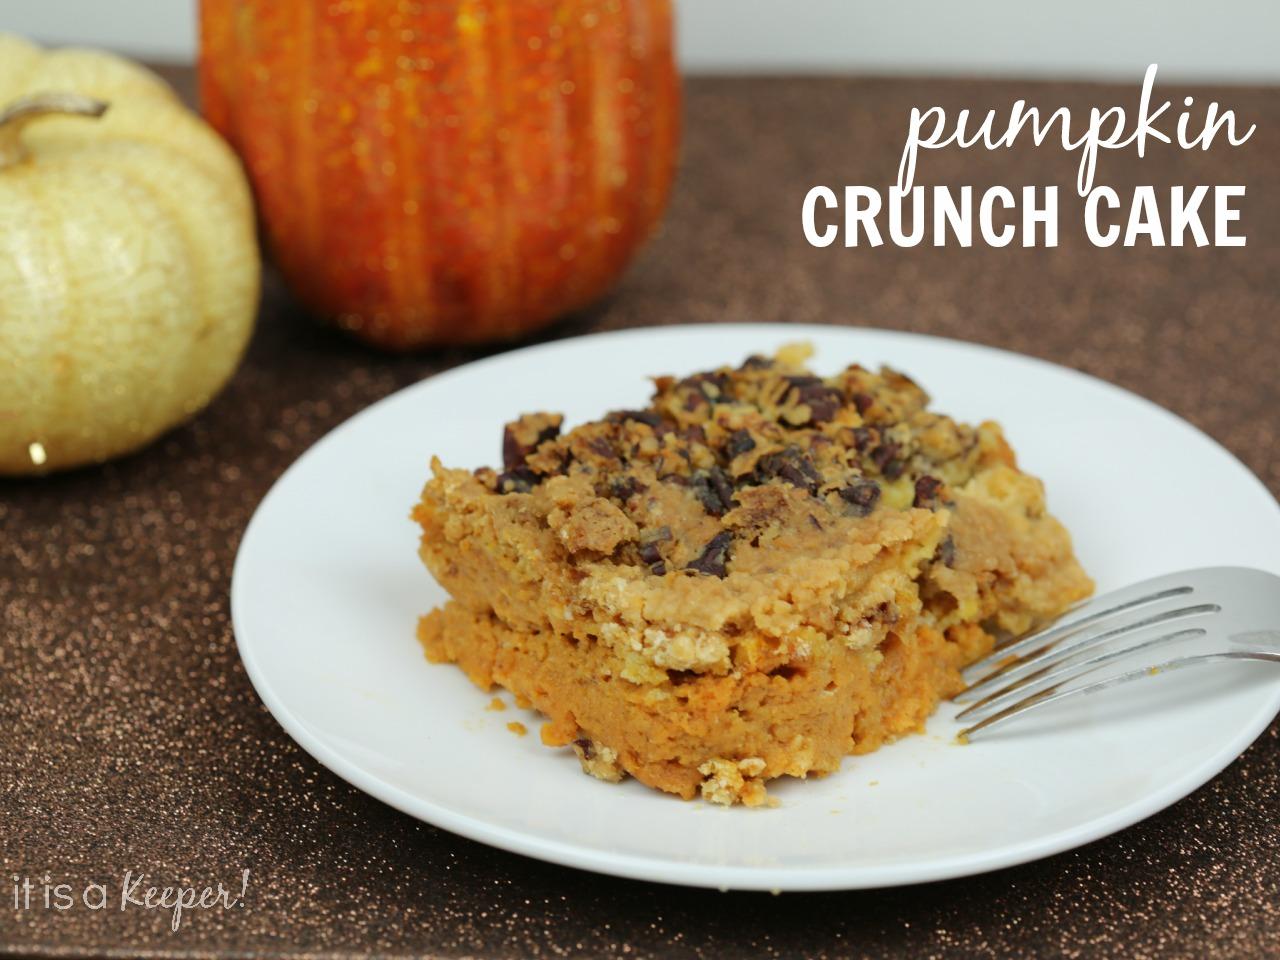 Pumpkin Crunch Cake on a white plate